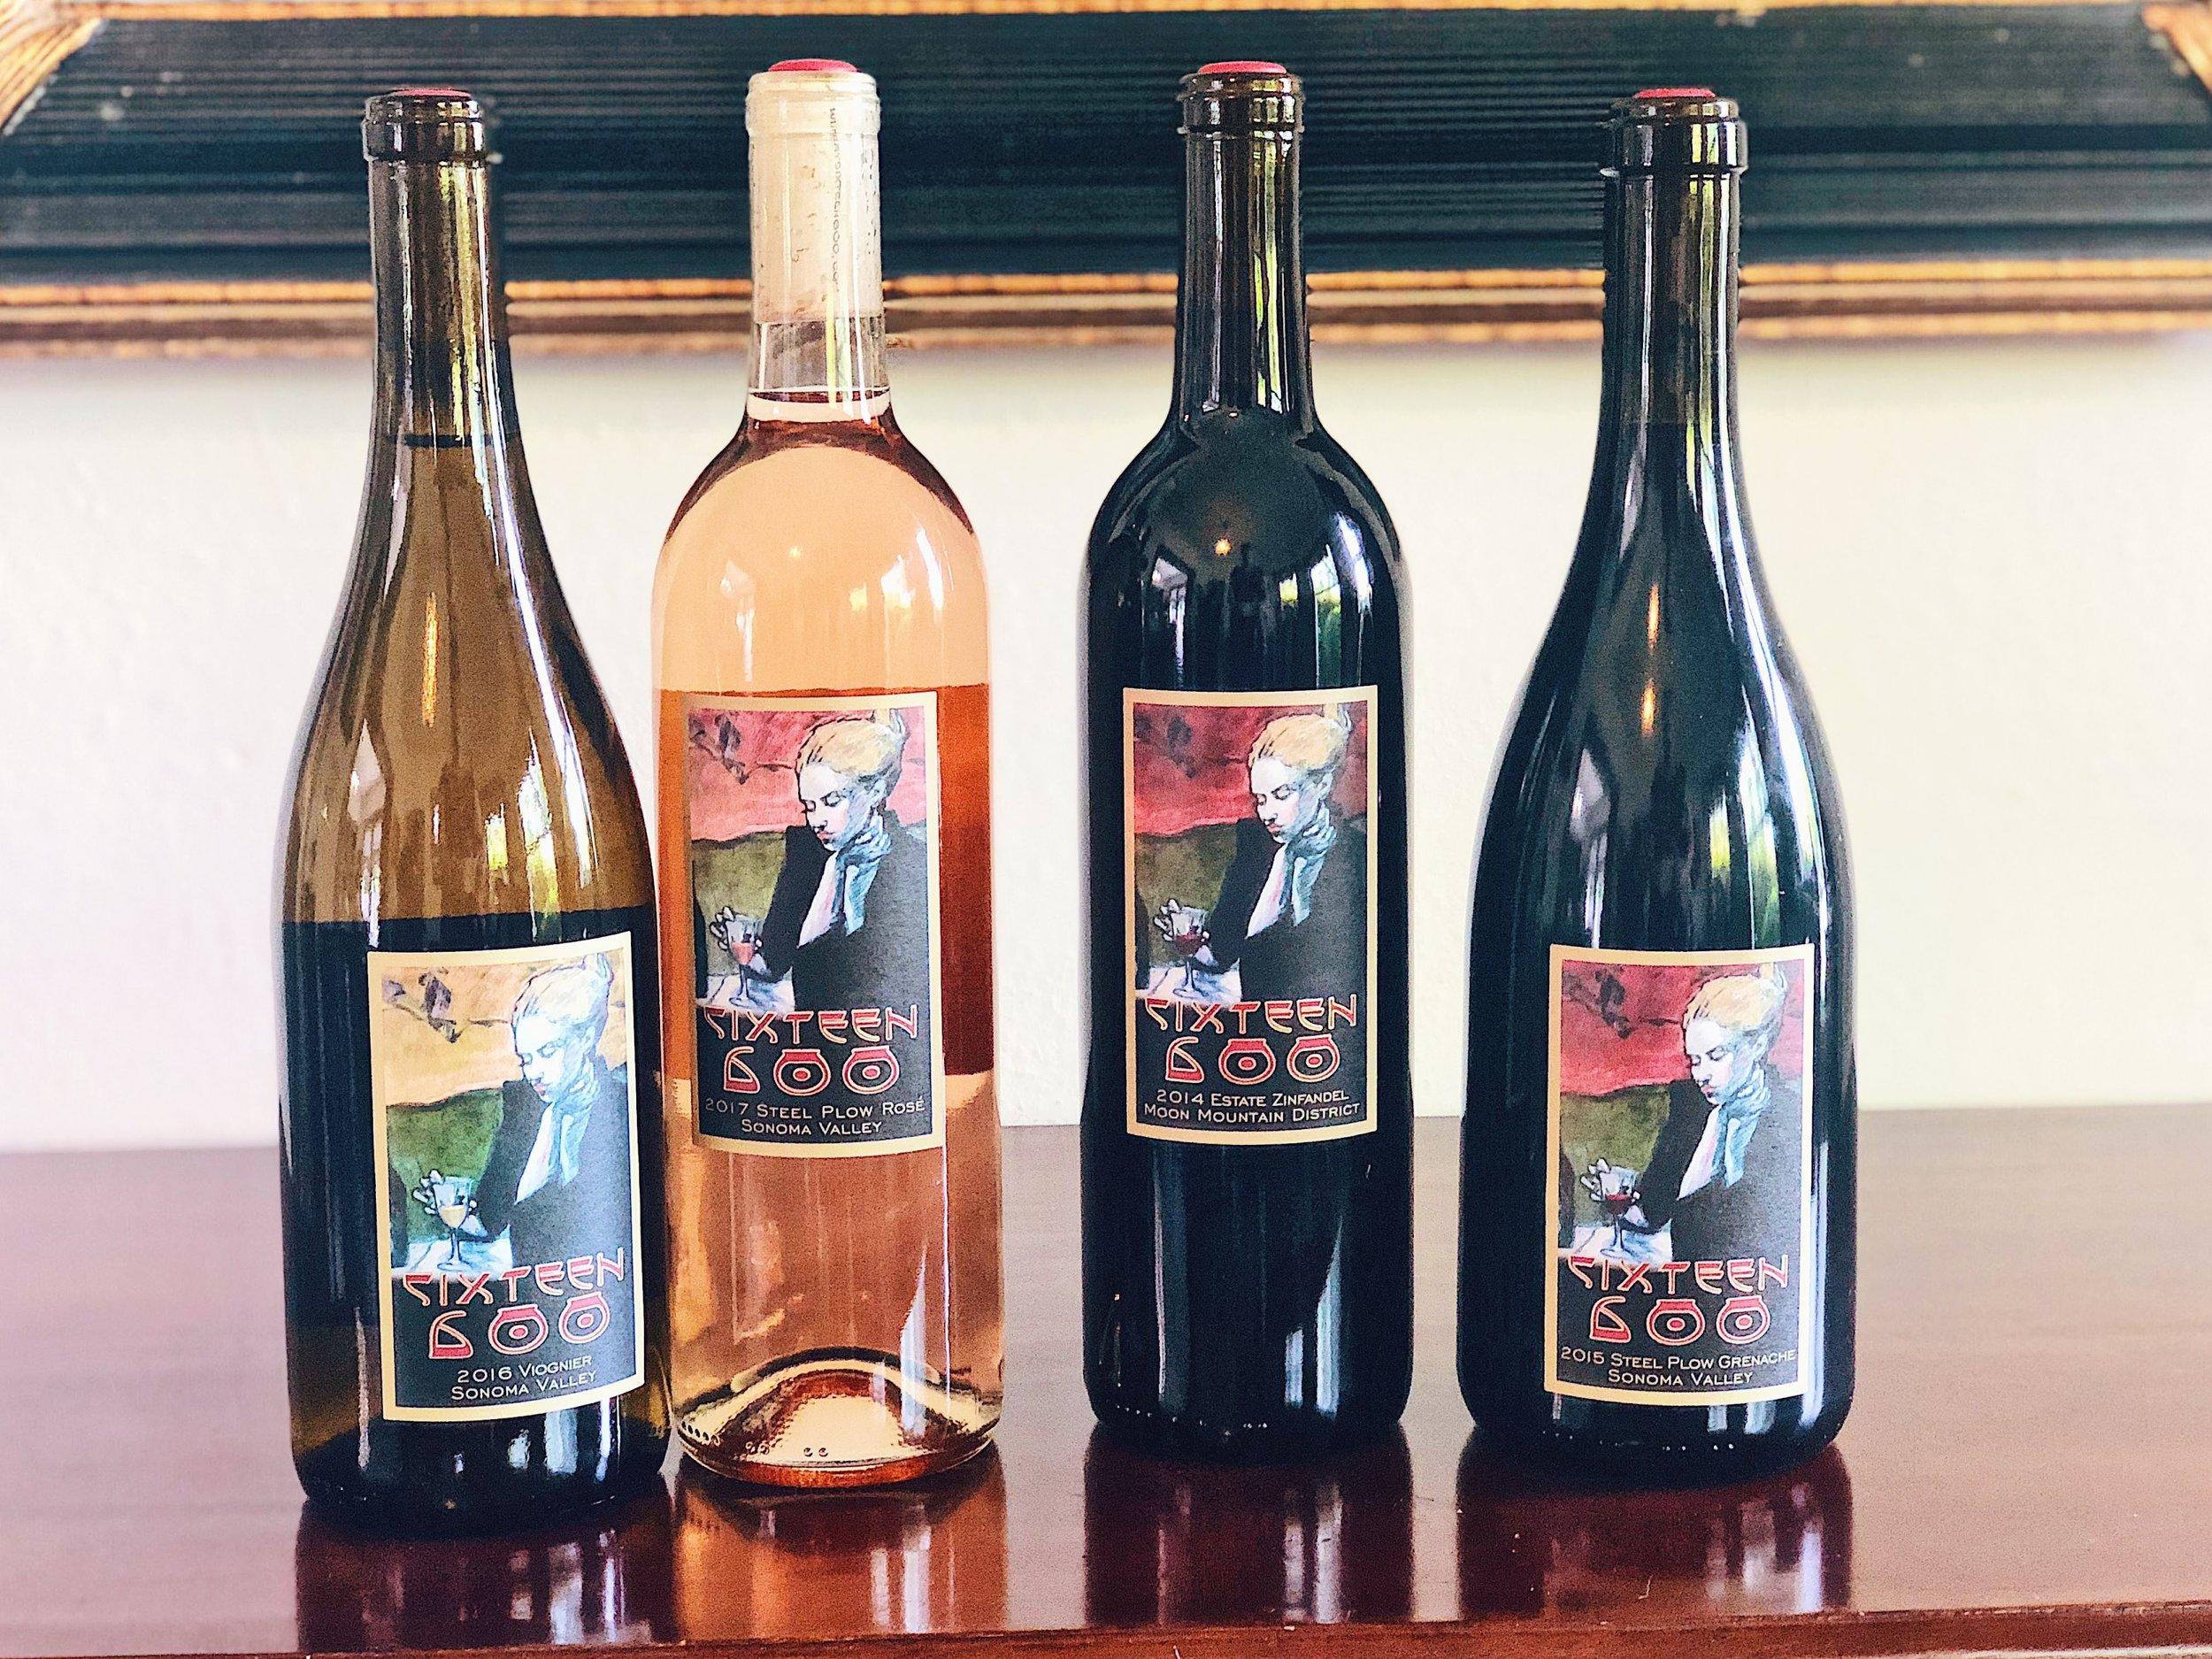 Winery Sixteen 600 Wine Bottles